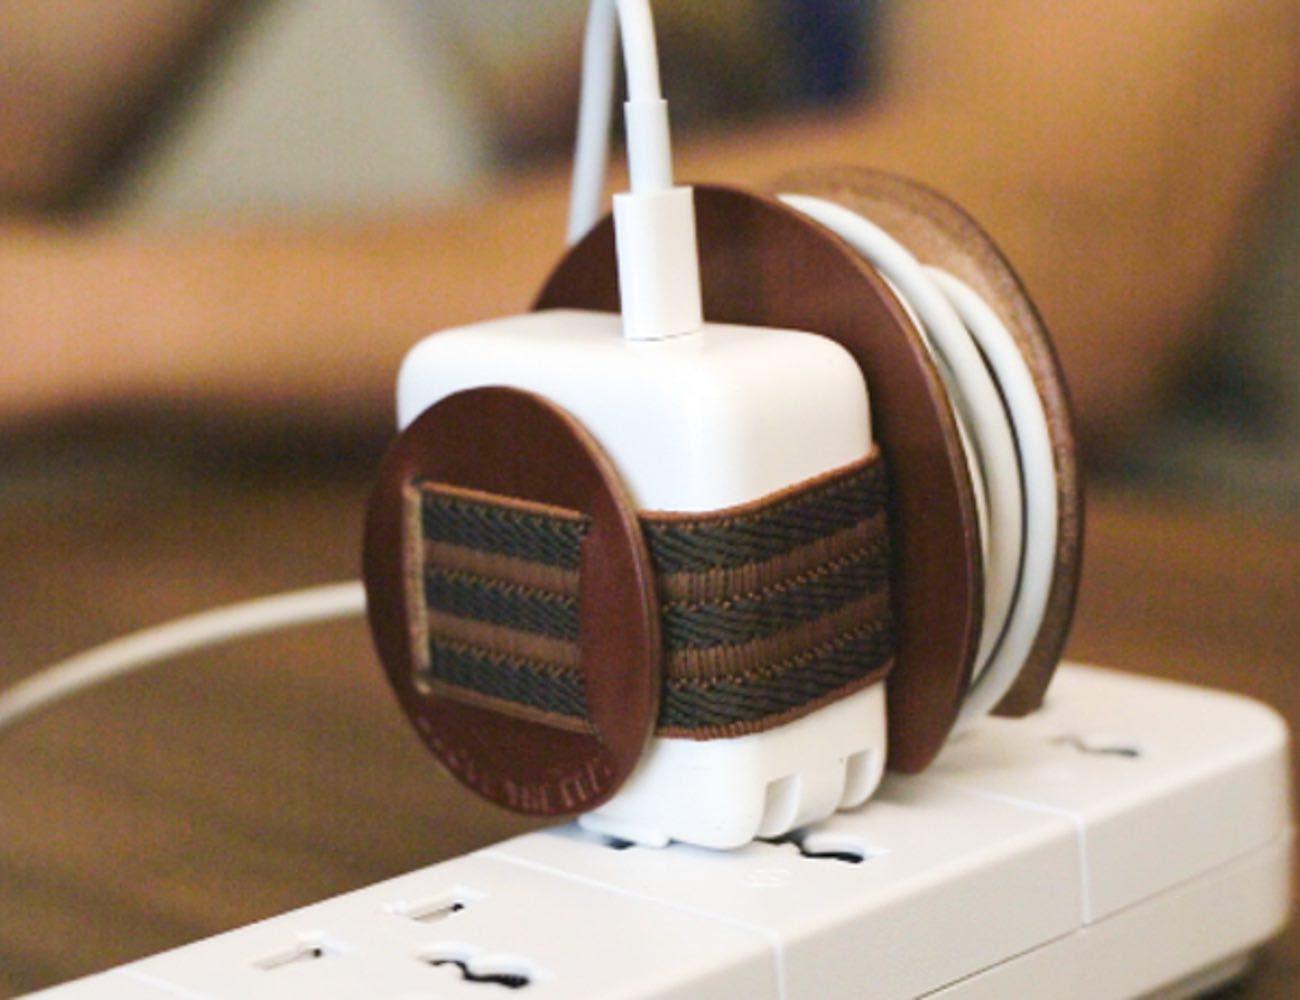 Macbook Adapter Cord Organizer